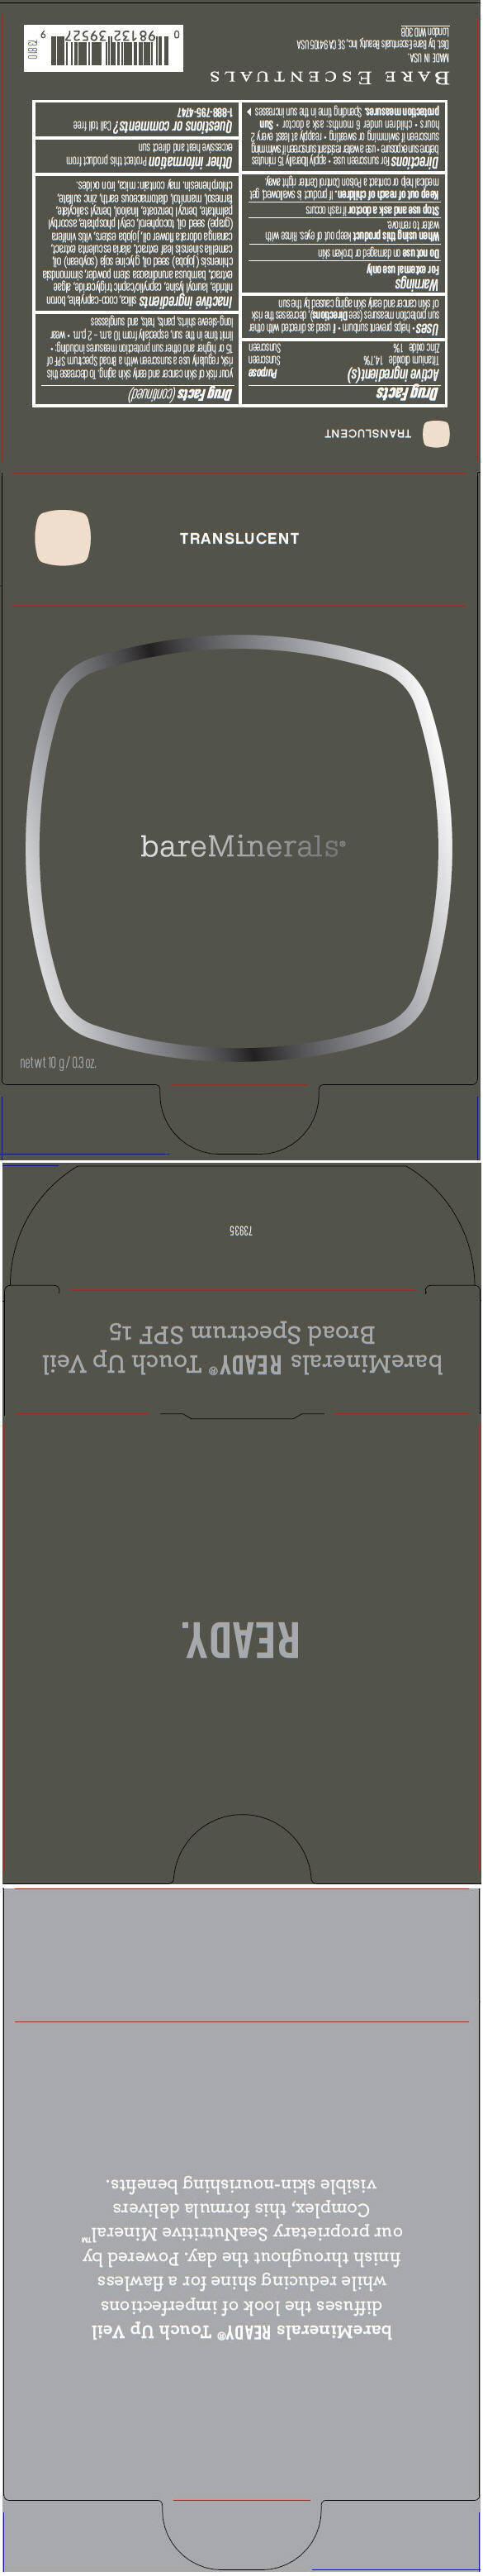 Principal Display Panel - 10 g Tray Carton -Translucent